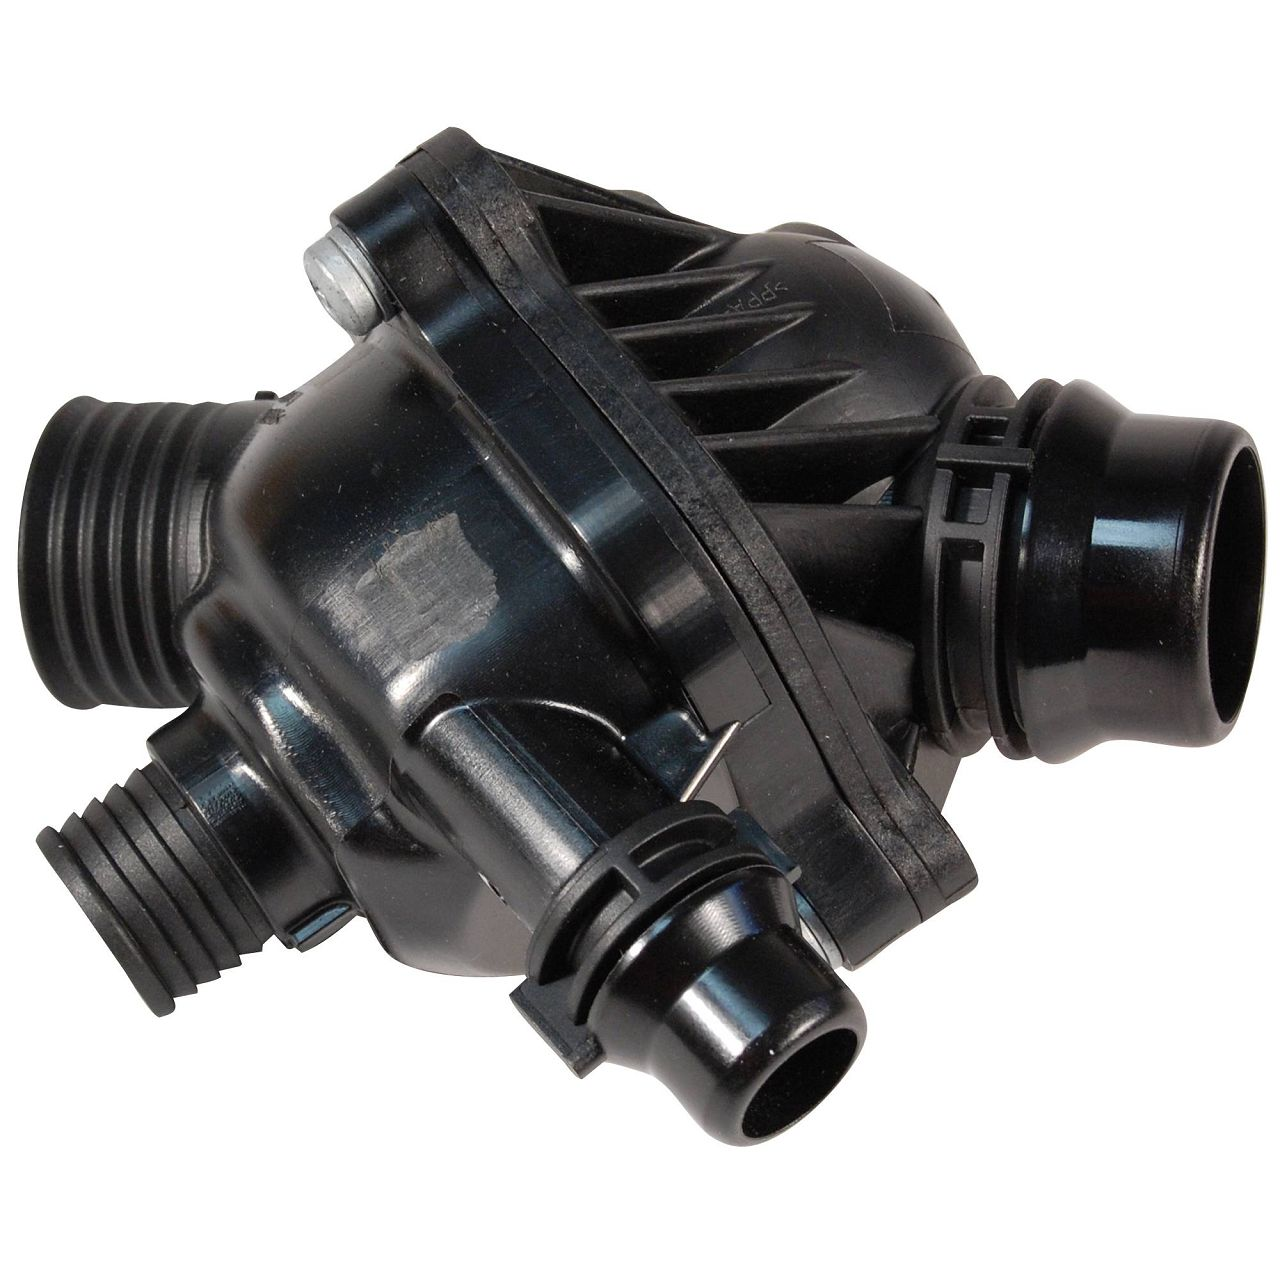 PIERBURG Wasserpumpe + BEHR / MAHLE Thermostat BMW 1er E81 3er E92 5er 6er 7er X1 X3 Z4